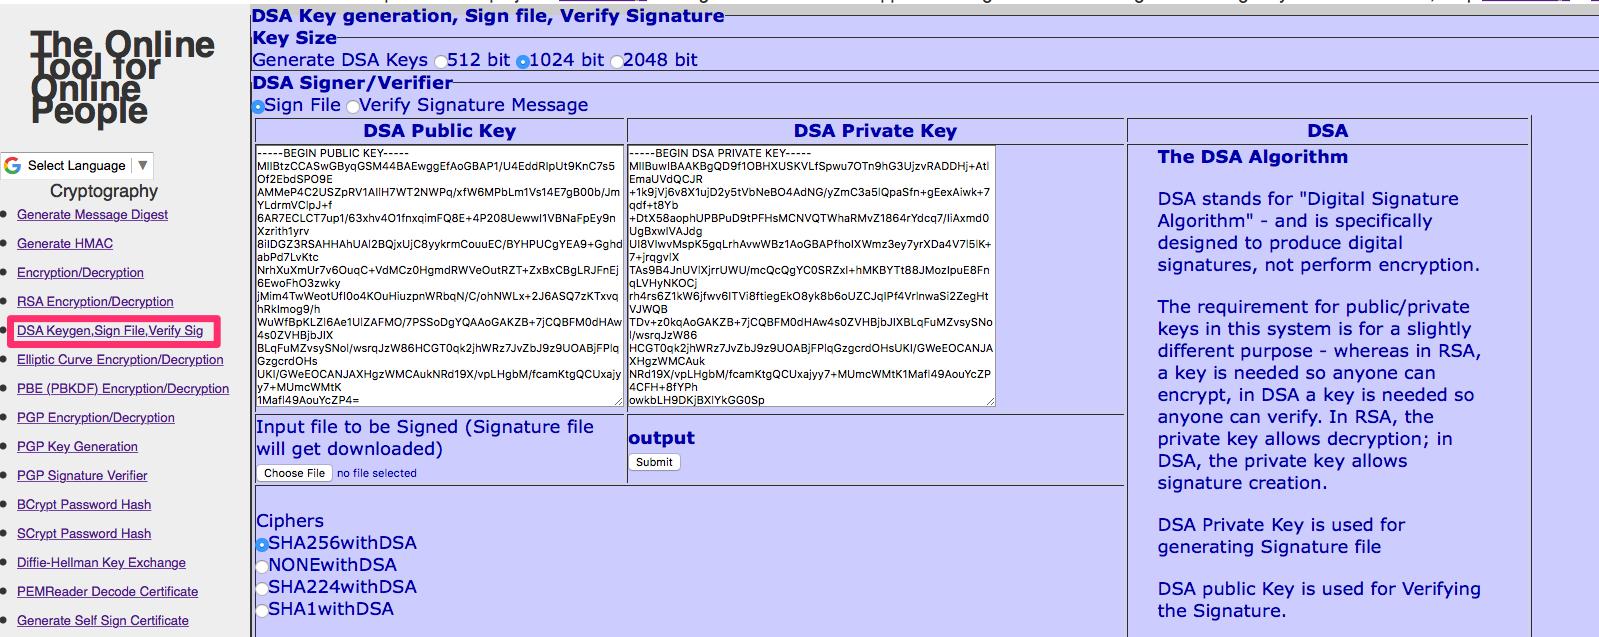 Pin by Anish Nath on Cryptography | Generate key, Verify, Key